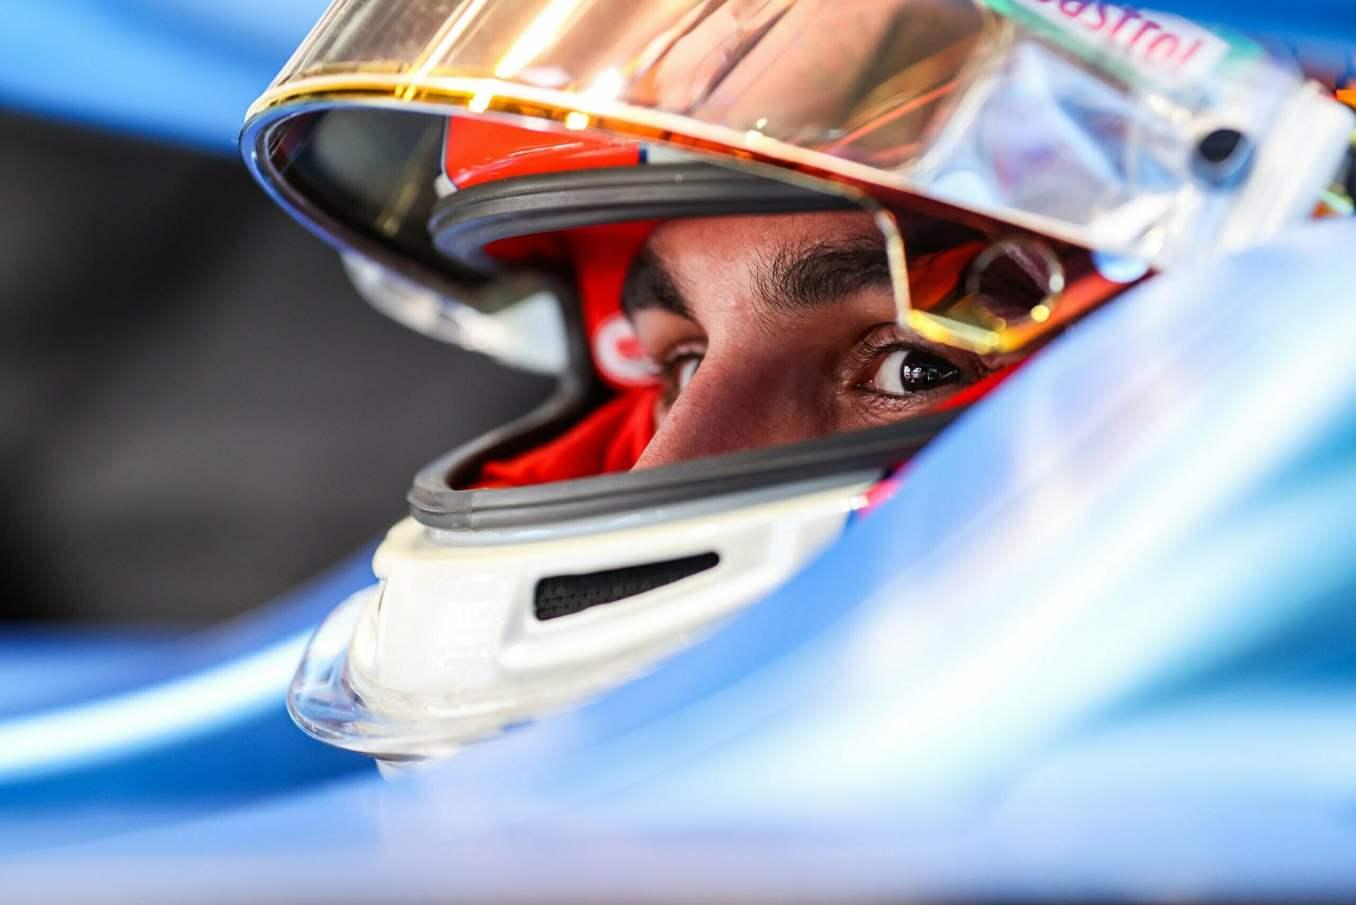 e392 831d 4d94 4d1e9213a842 ea0959f8e7187da0cf11b511c34b98533bef3daf scaled   Alpine F1 Team : Grand Prix Heineken du Portugal de Formule 1 2021